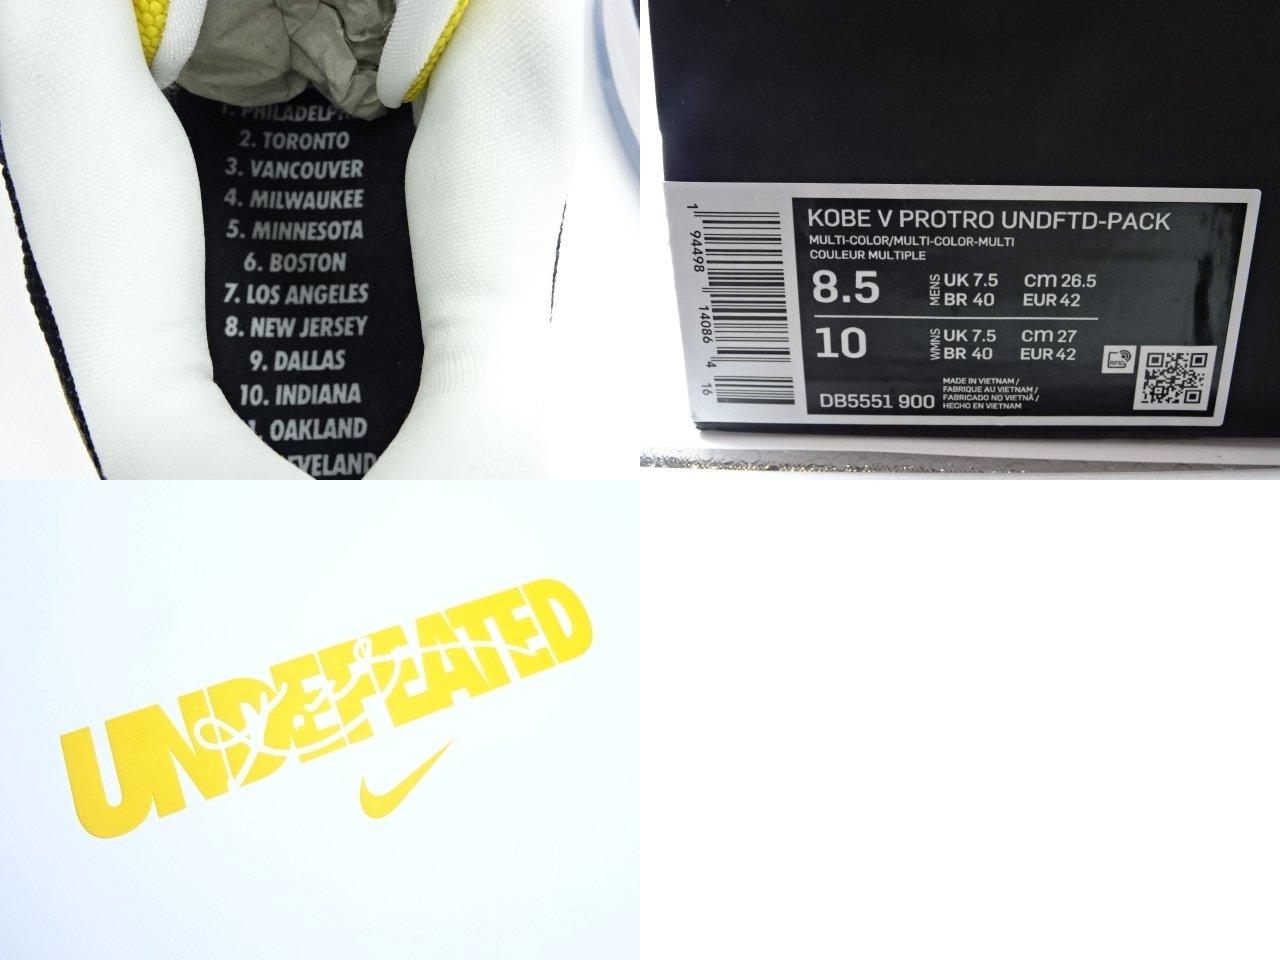 NIKE KOBE5 PROTRO UNDFTD-PACK Size-26.5cm コービー アンディフィーテッド DB5551-900 大名店【中古】